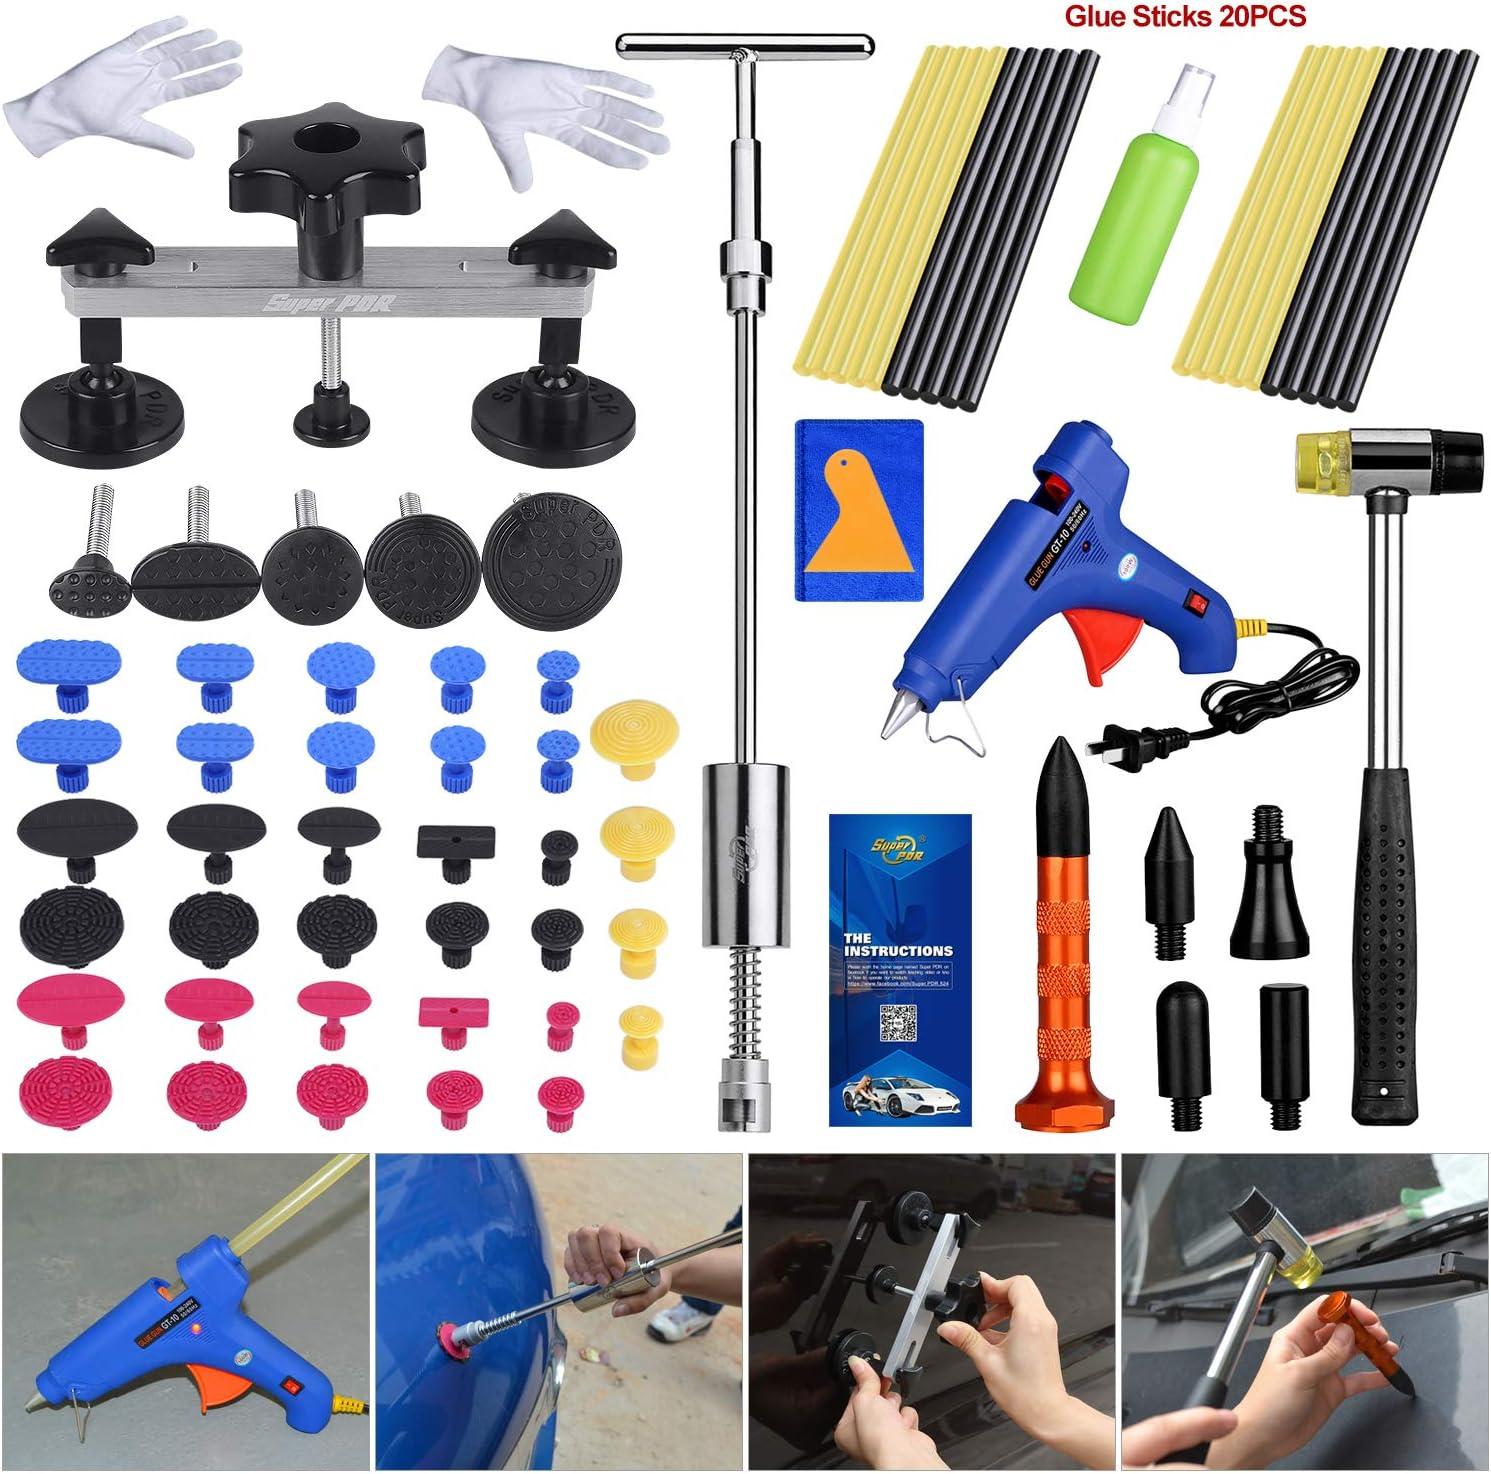 Kuinayouyi Paintless Dent Repair Hail Removal T Bar Slide Hammer+18pcs Glue Puller Tabs Nin